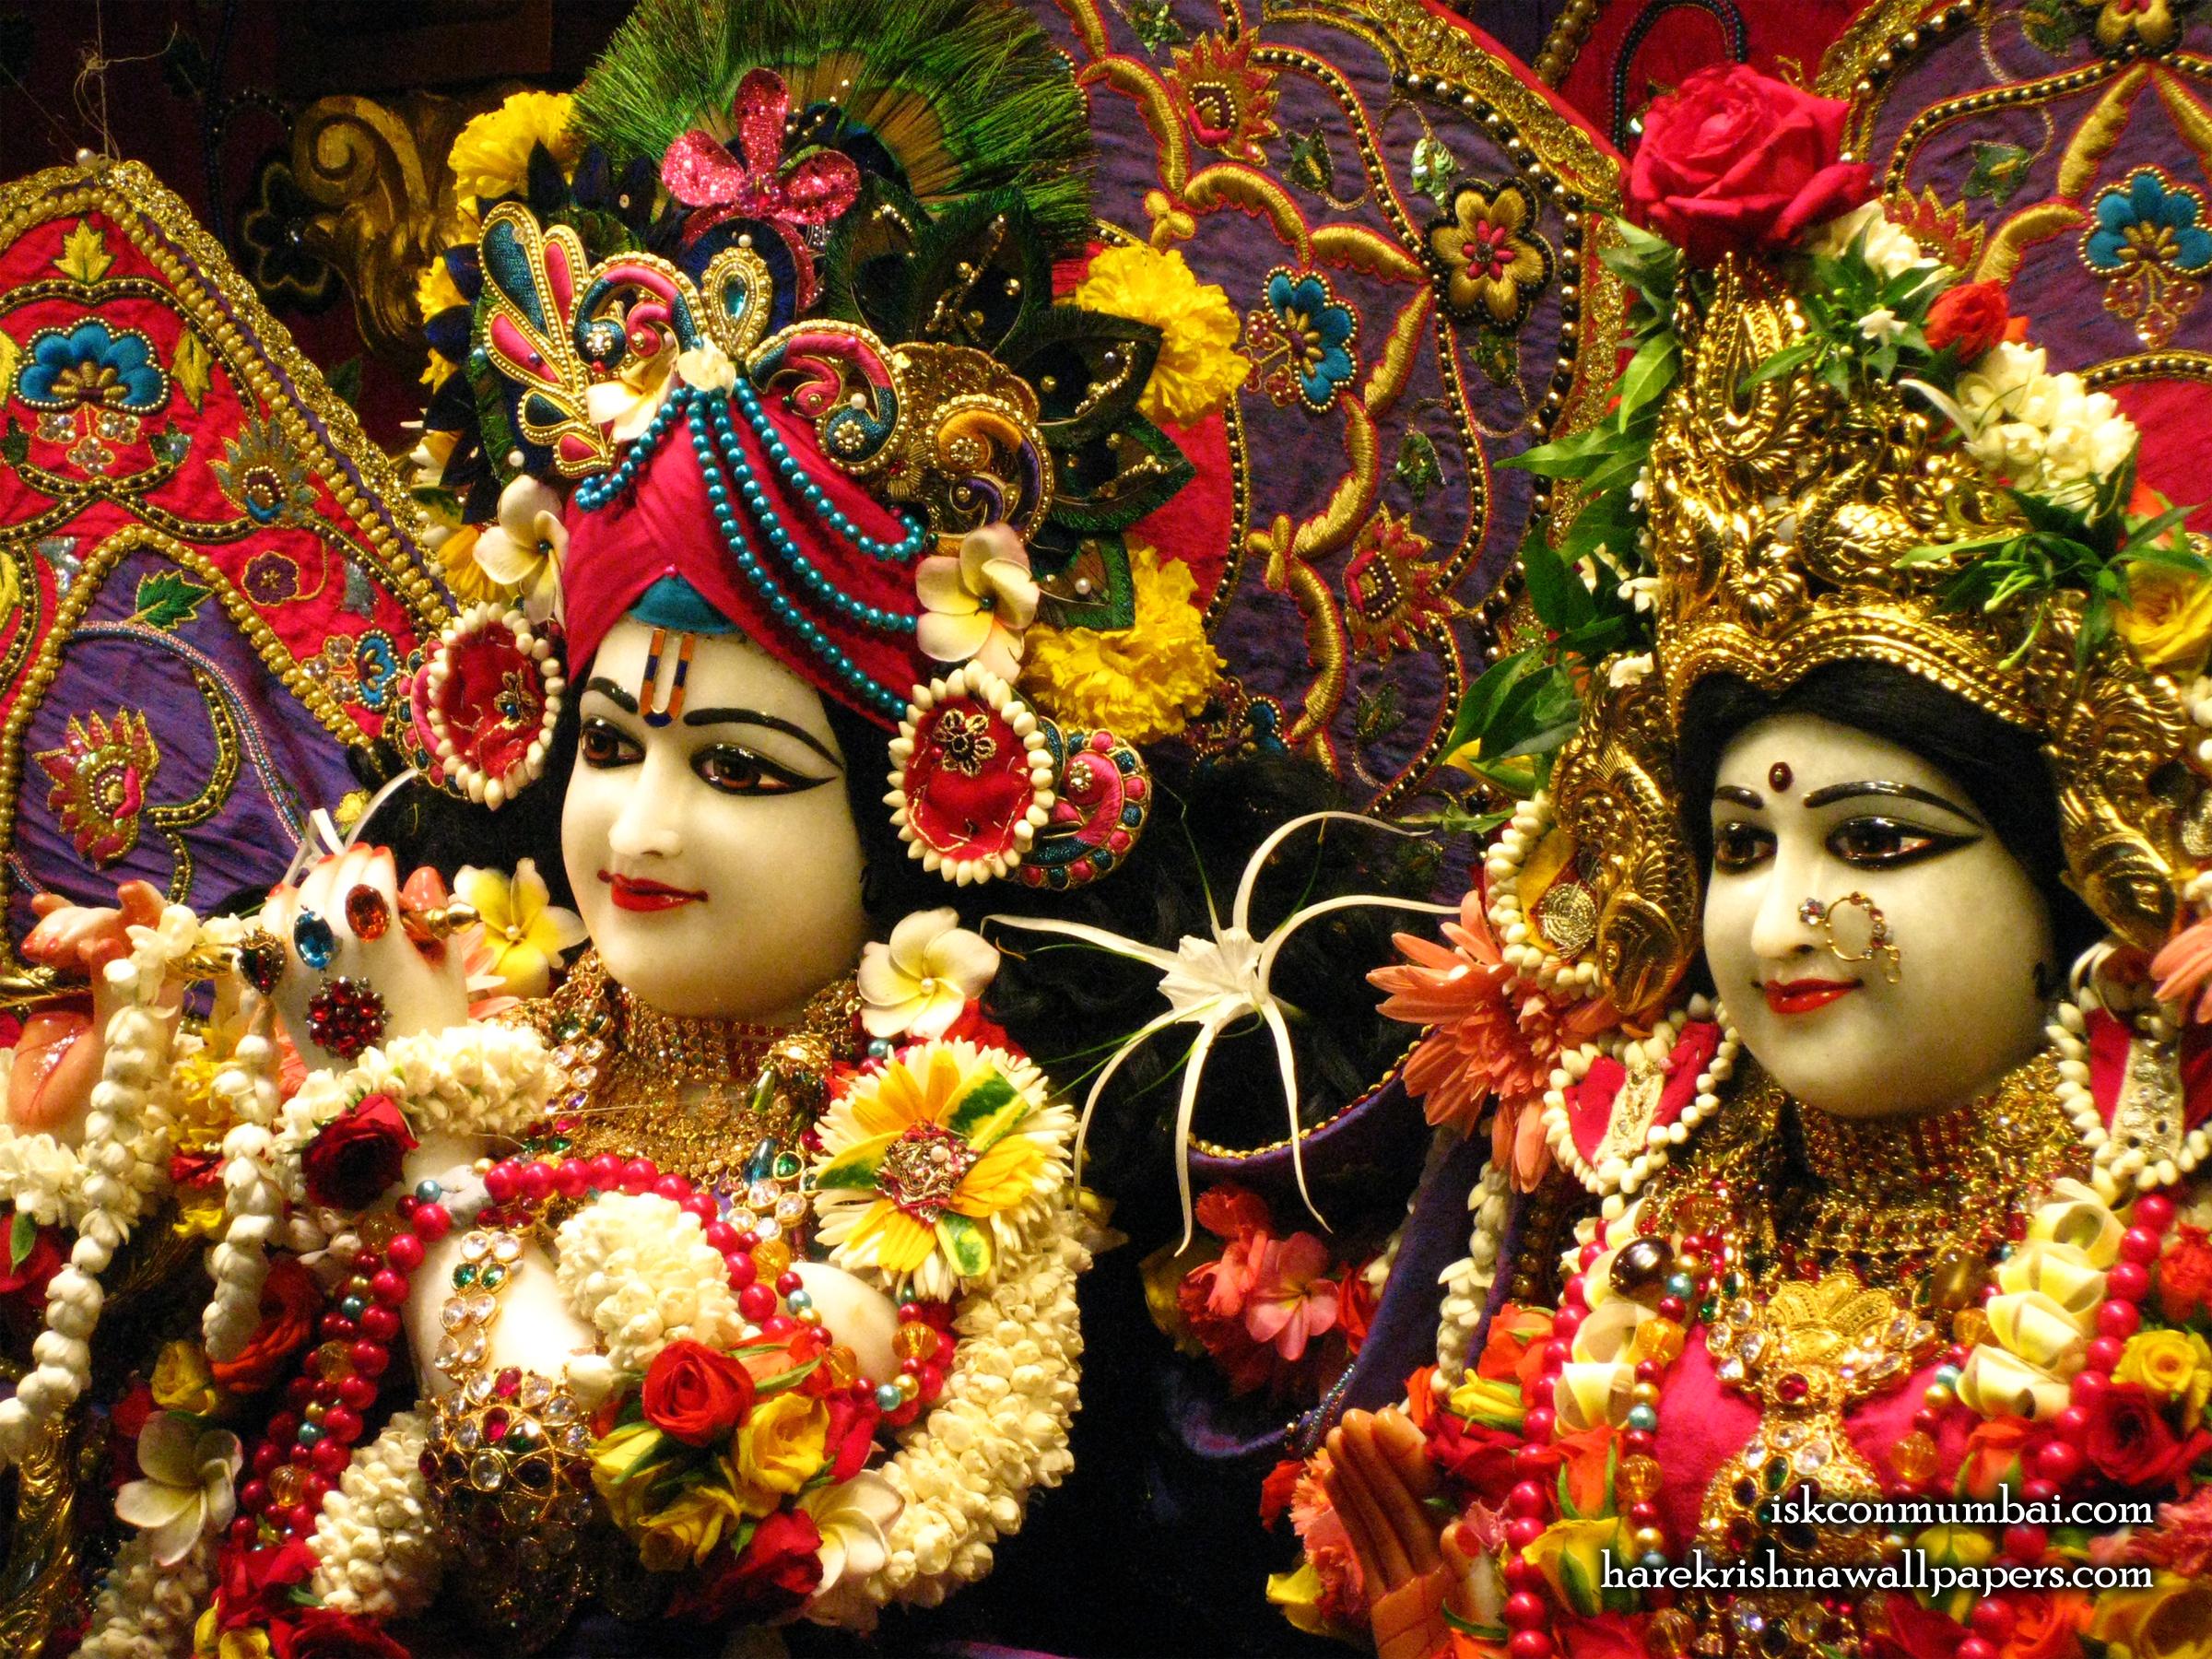 Sri Sri Radha Rasabihari Close up Wallpaper (013) Size 2400x1800 Download